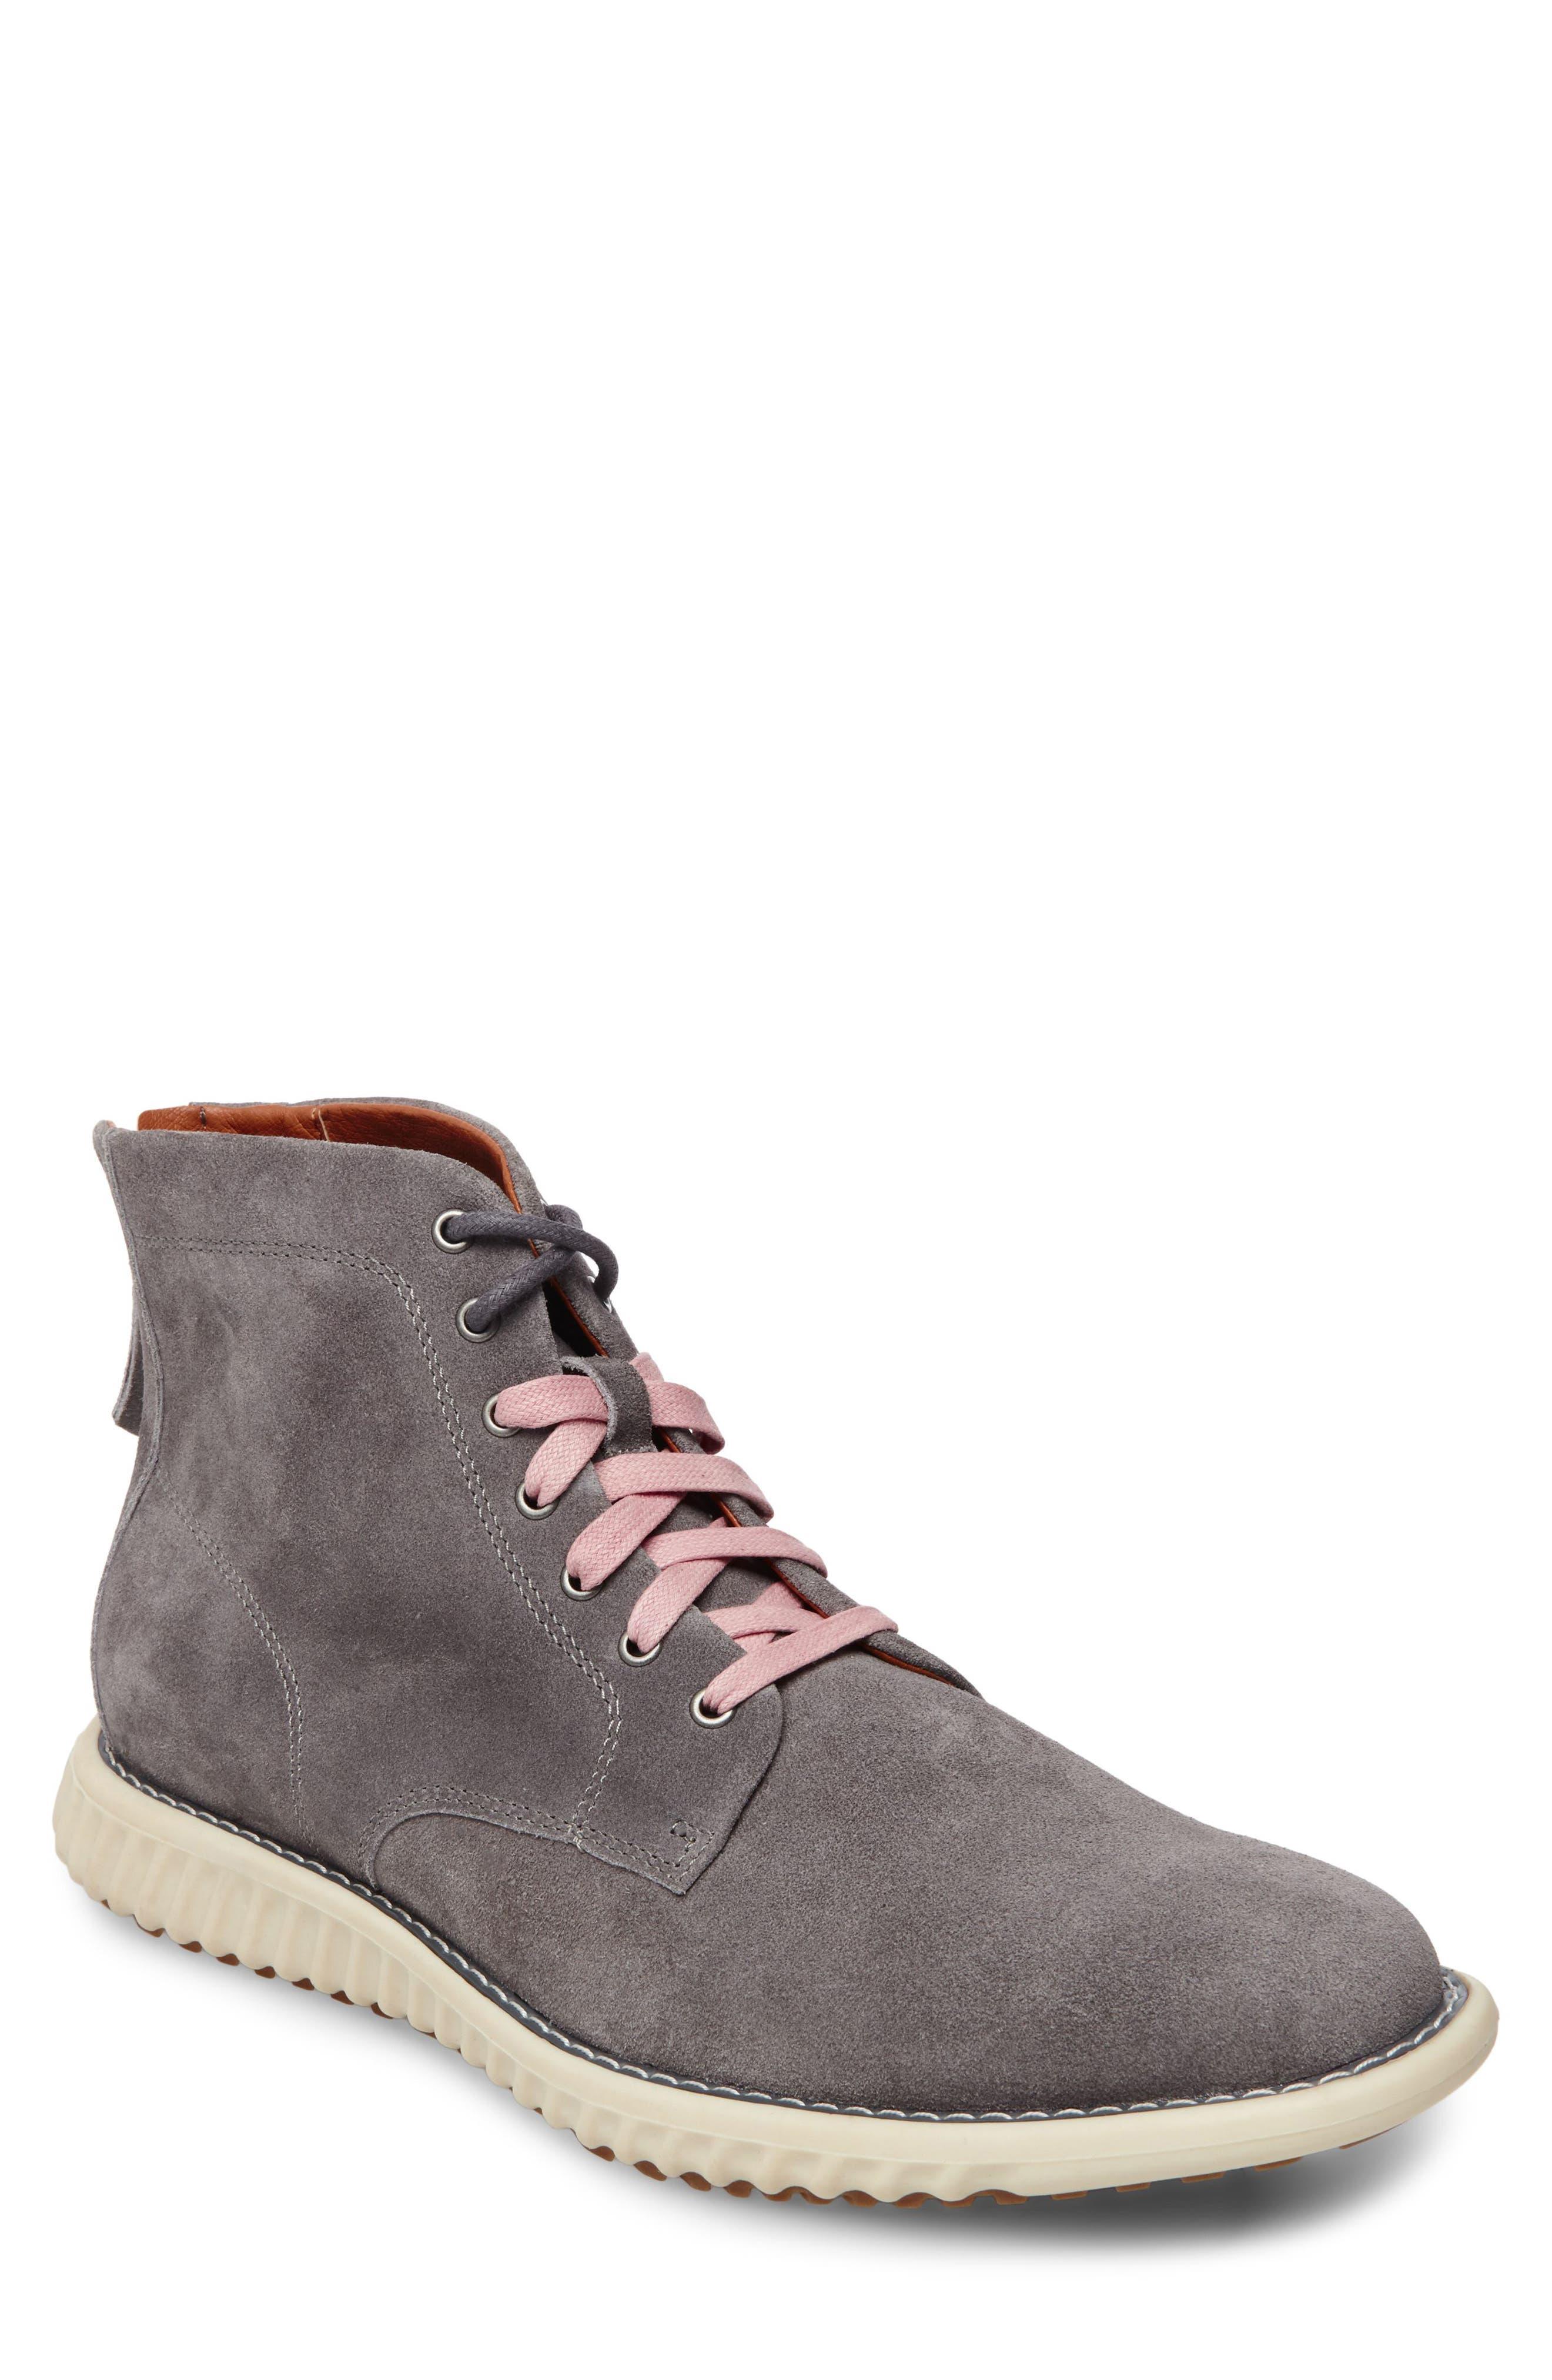 Verner Suede Plain Toe Boot,                             Main thumbnail 1, color,                             074